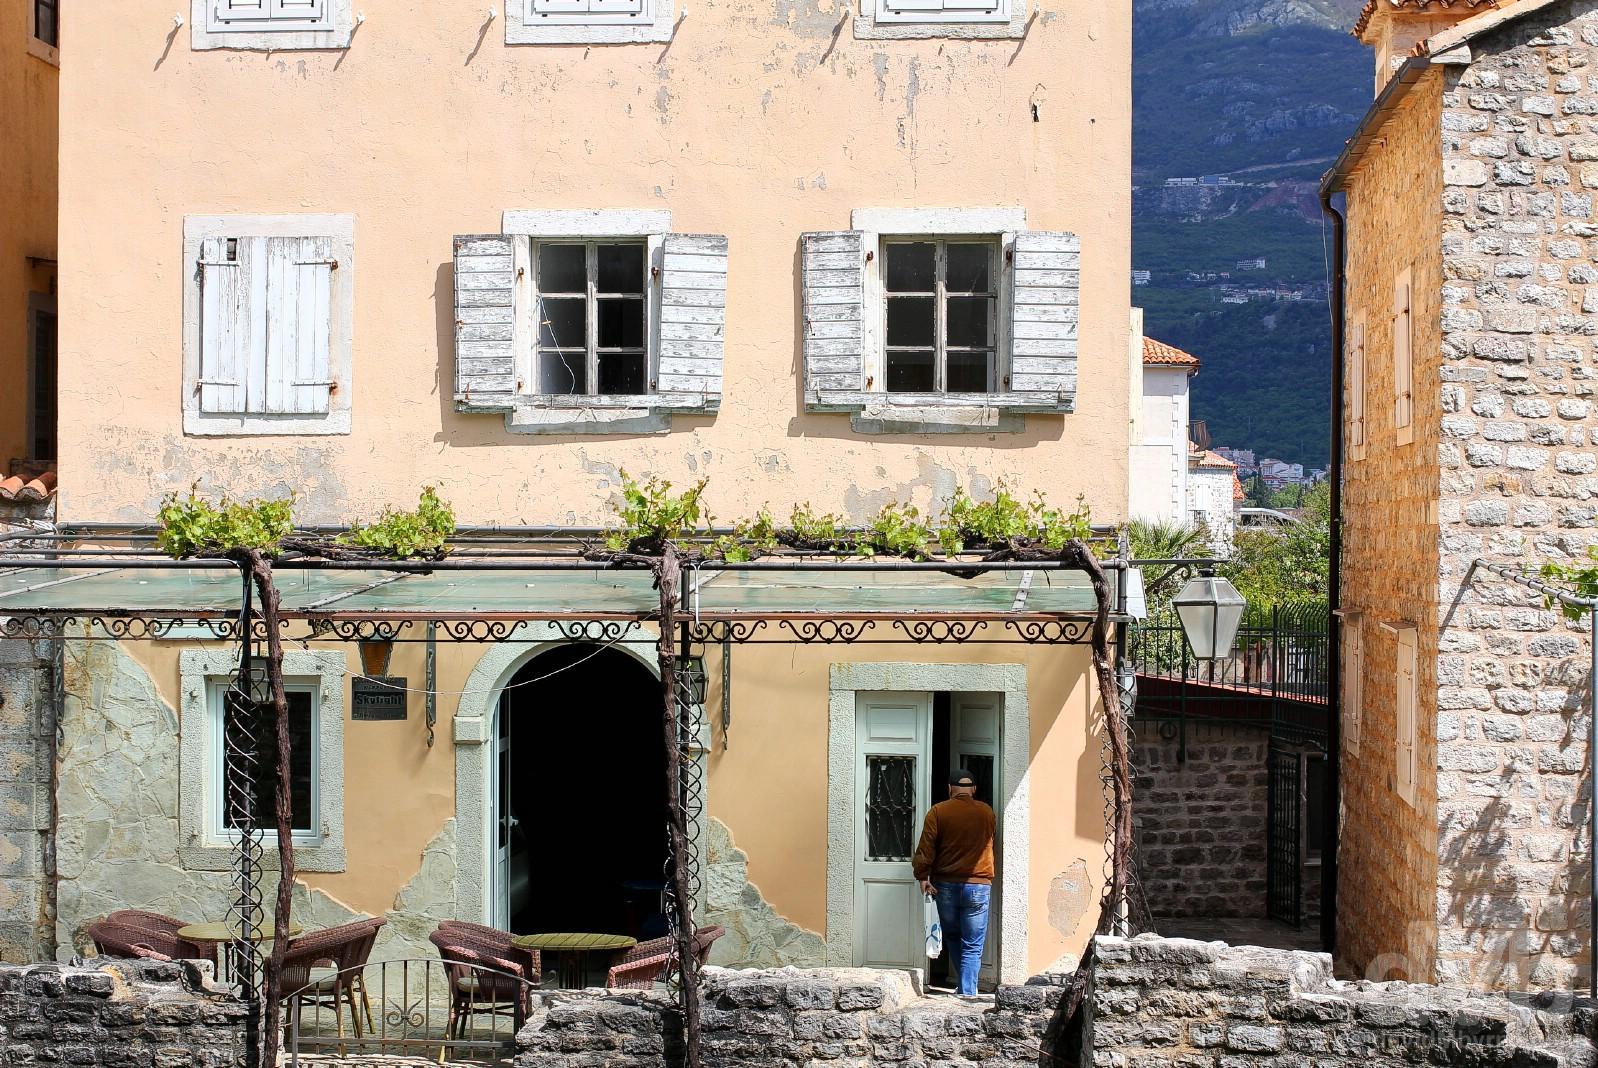 Stari Grad (Old Town), Budva, Montenegro. April 21, 2017.